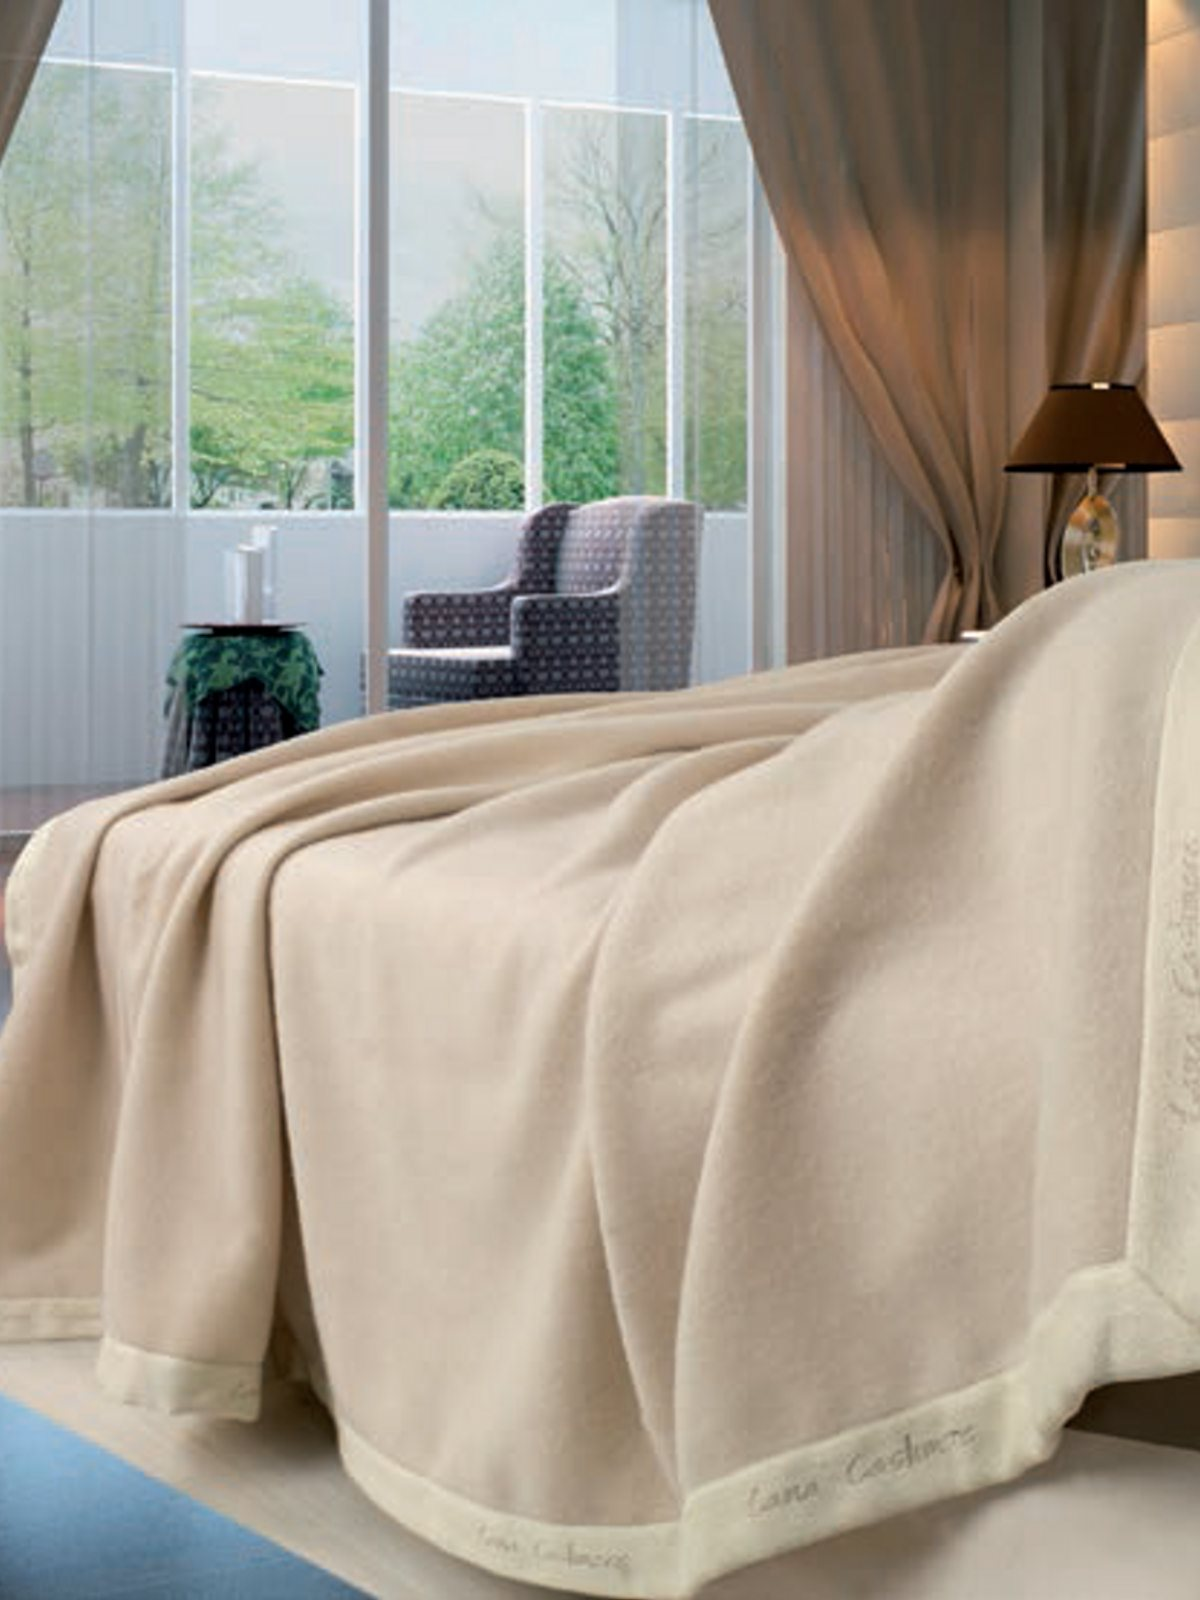 plaid en cachemire et laine m rinos fiordiloto lanerossi. Black Bedroom Furniture Sets. Home Design Ideas